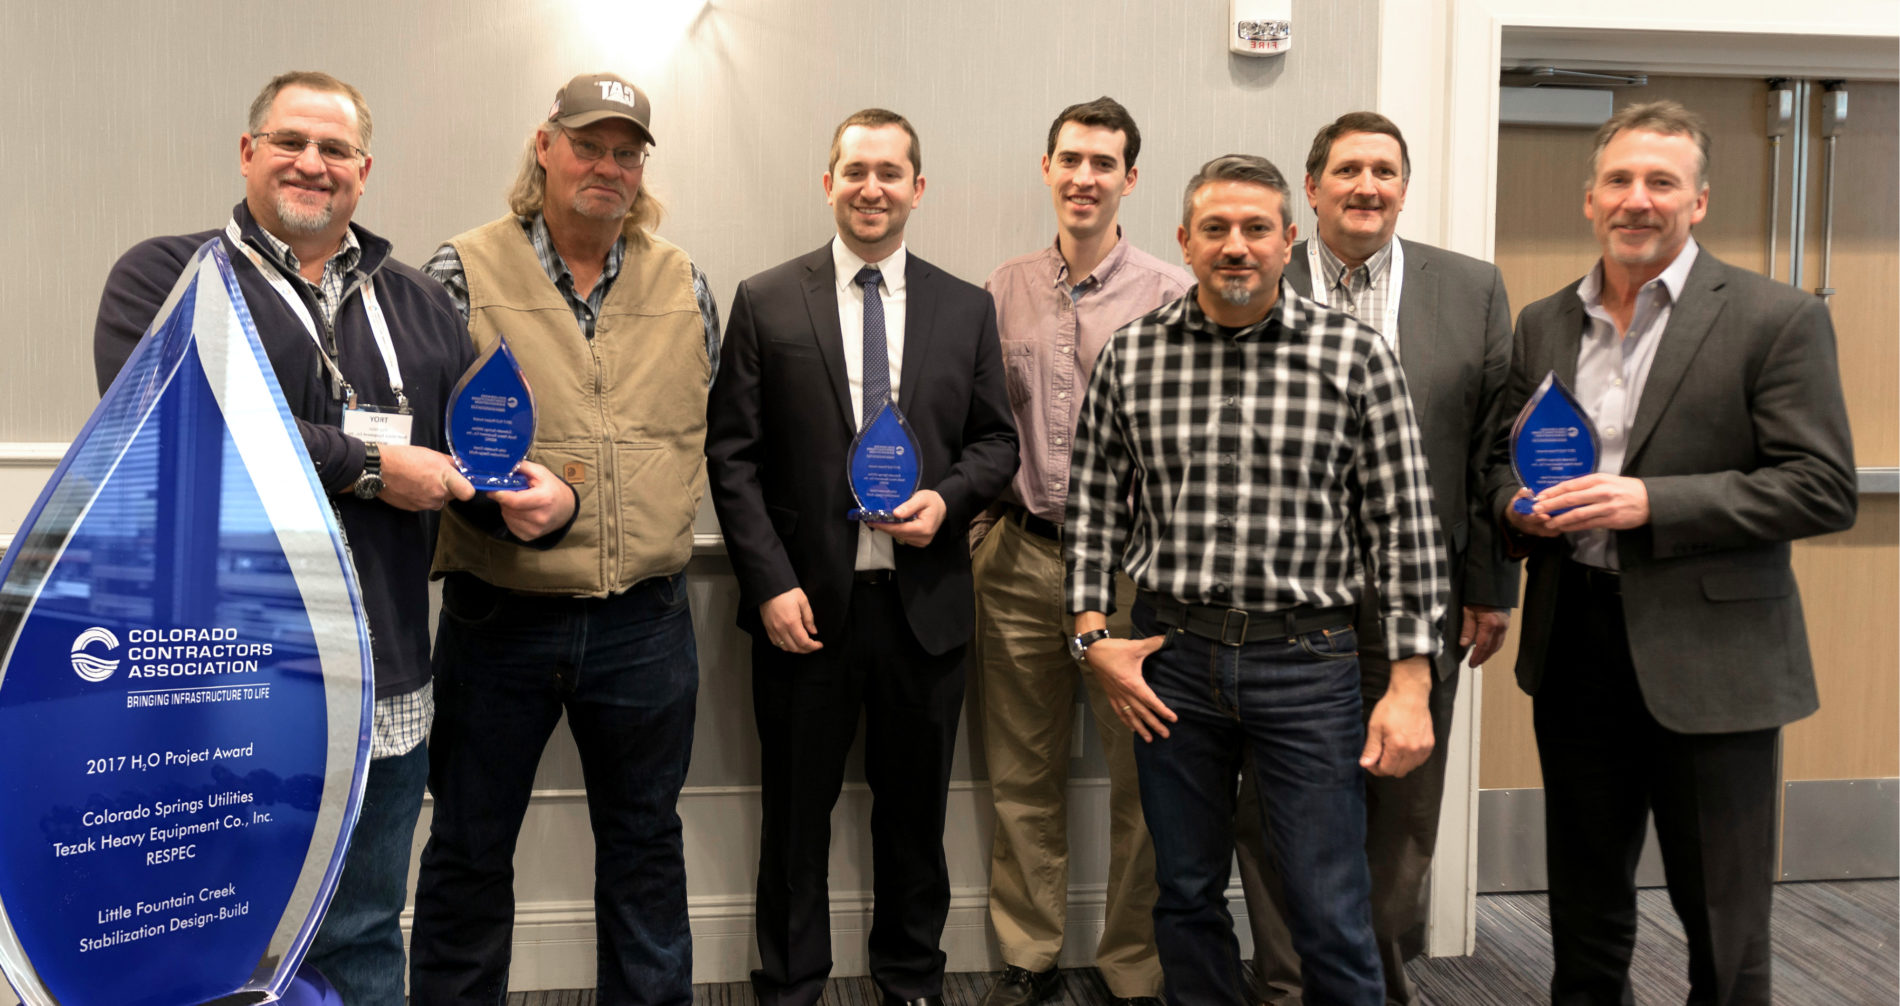 Image for Denver Group Earns Colorado Contractors' Association Award